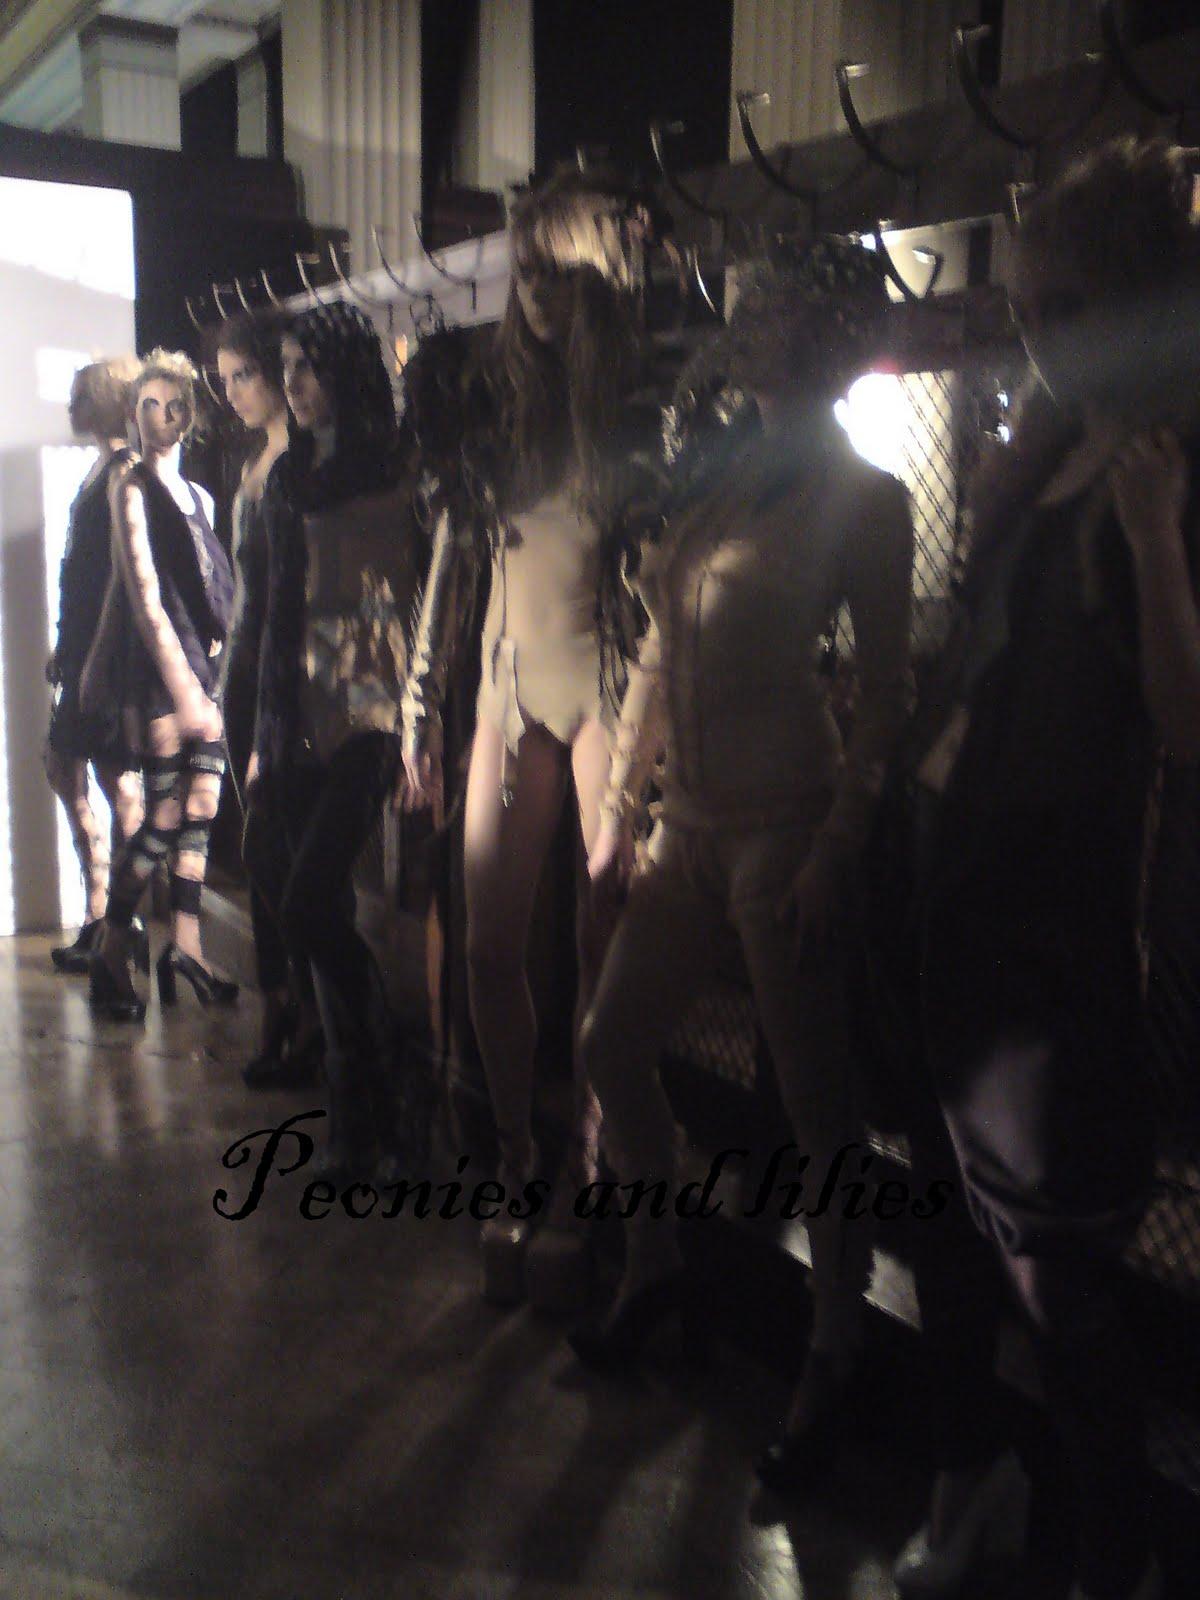 Nude fashion backstage pics